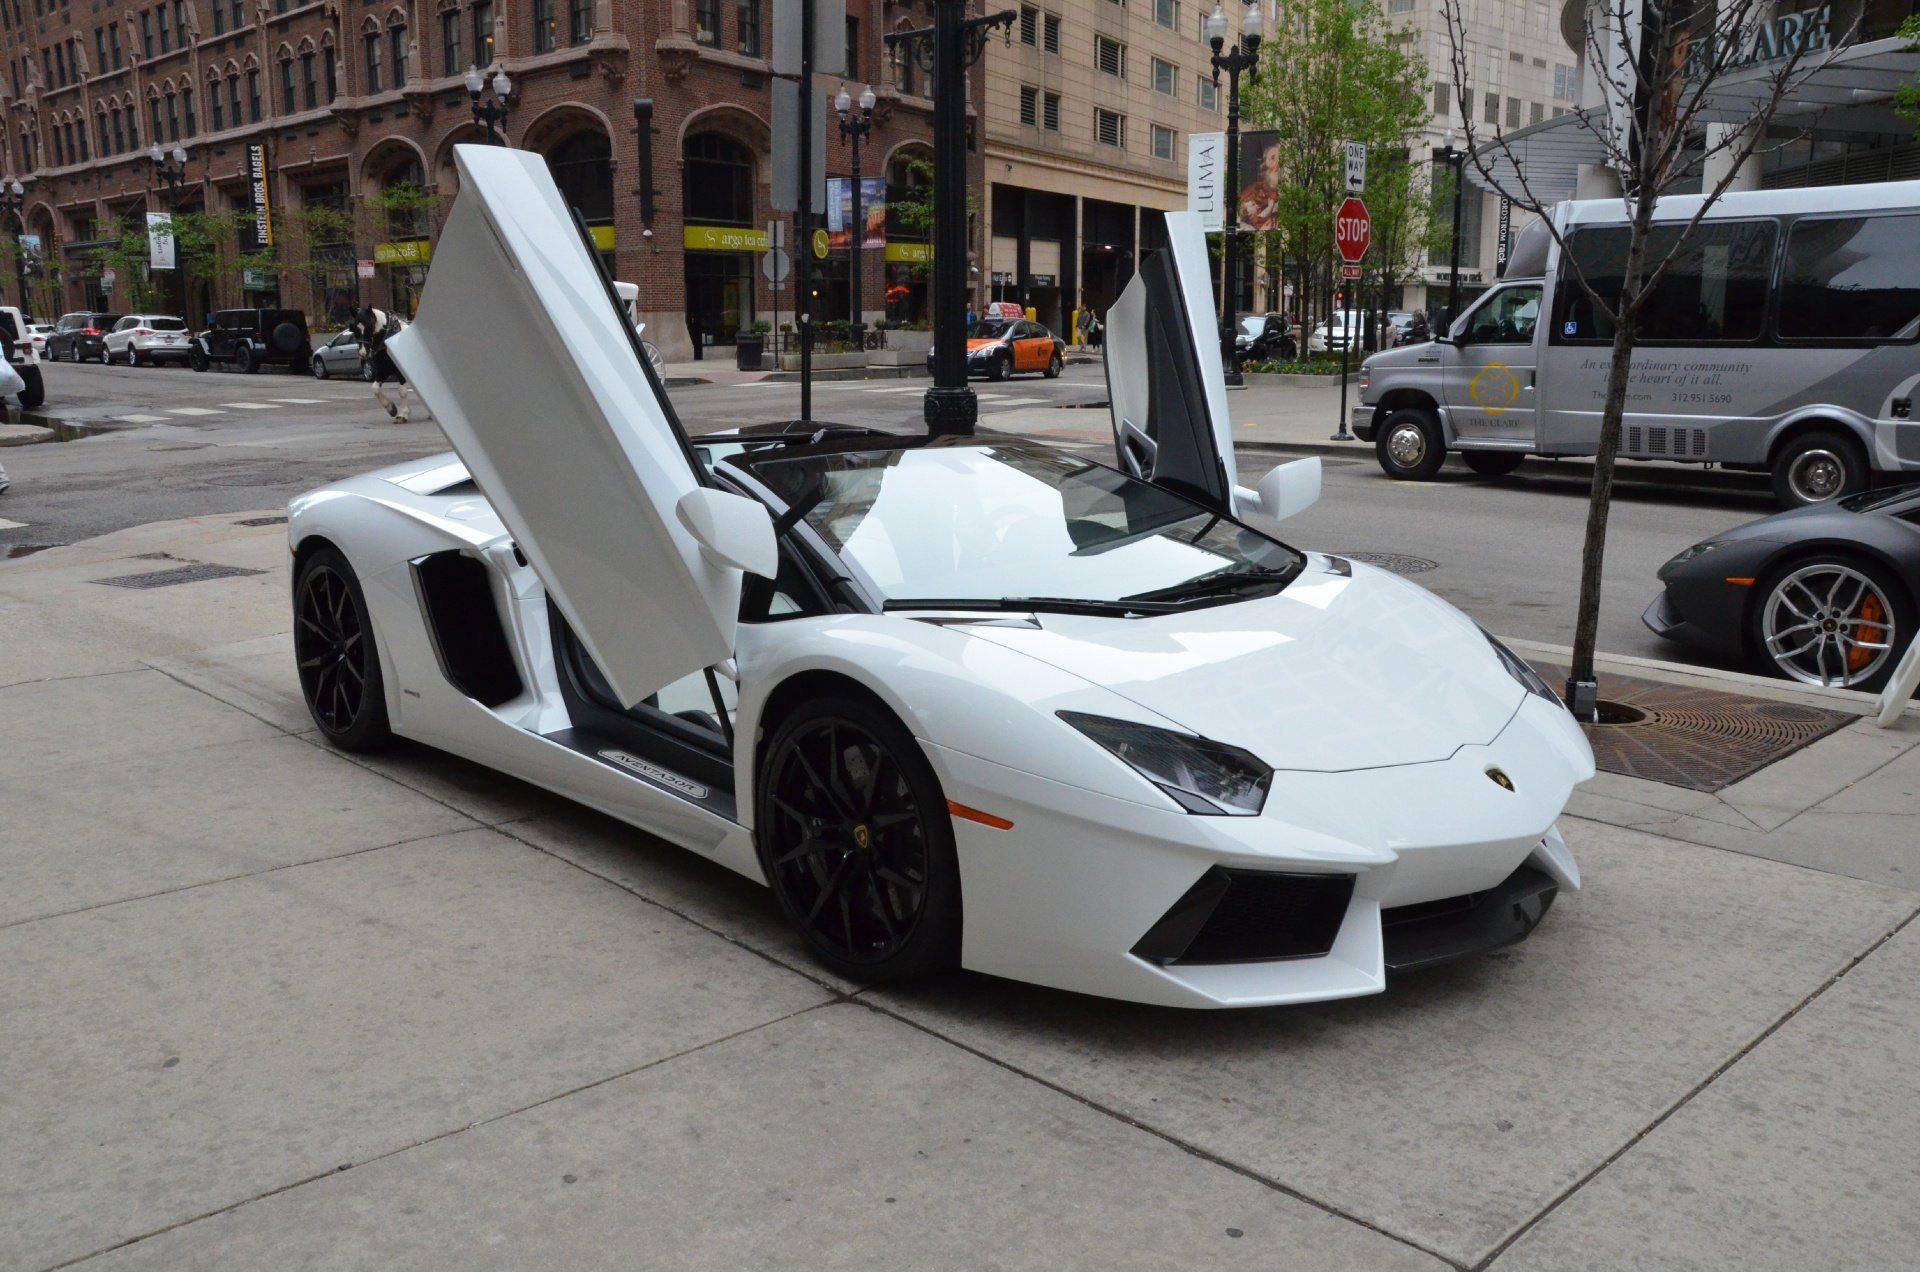 2014 lamborghini aventador roadster cars bianco isis white wallpaper 1920x1272 759862 wallpaperup - Lamborghini Aventador Roadster White